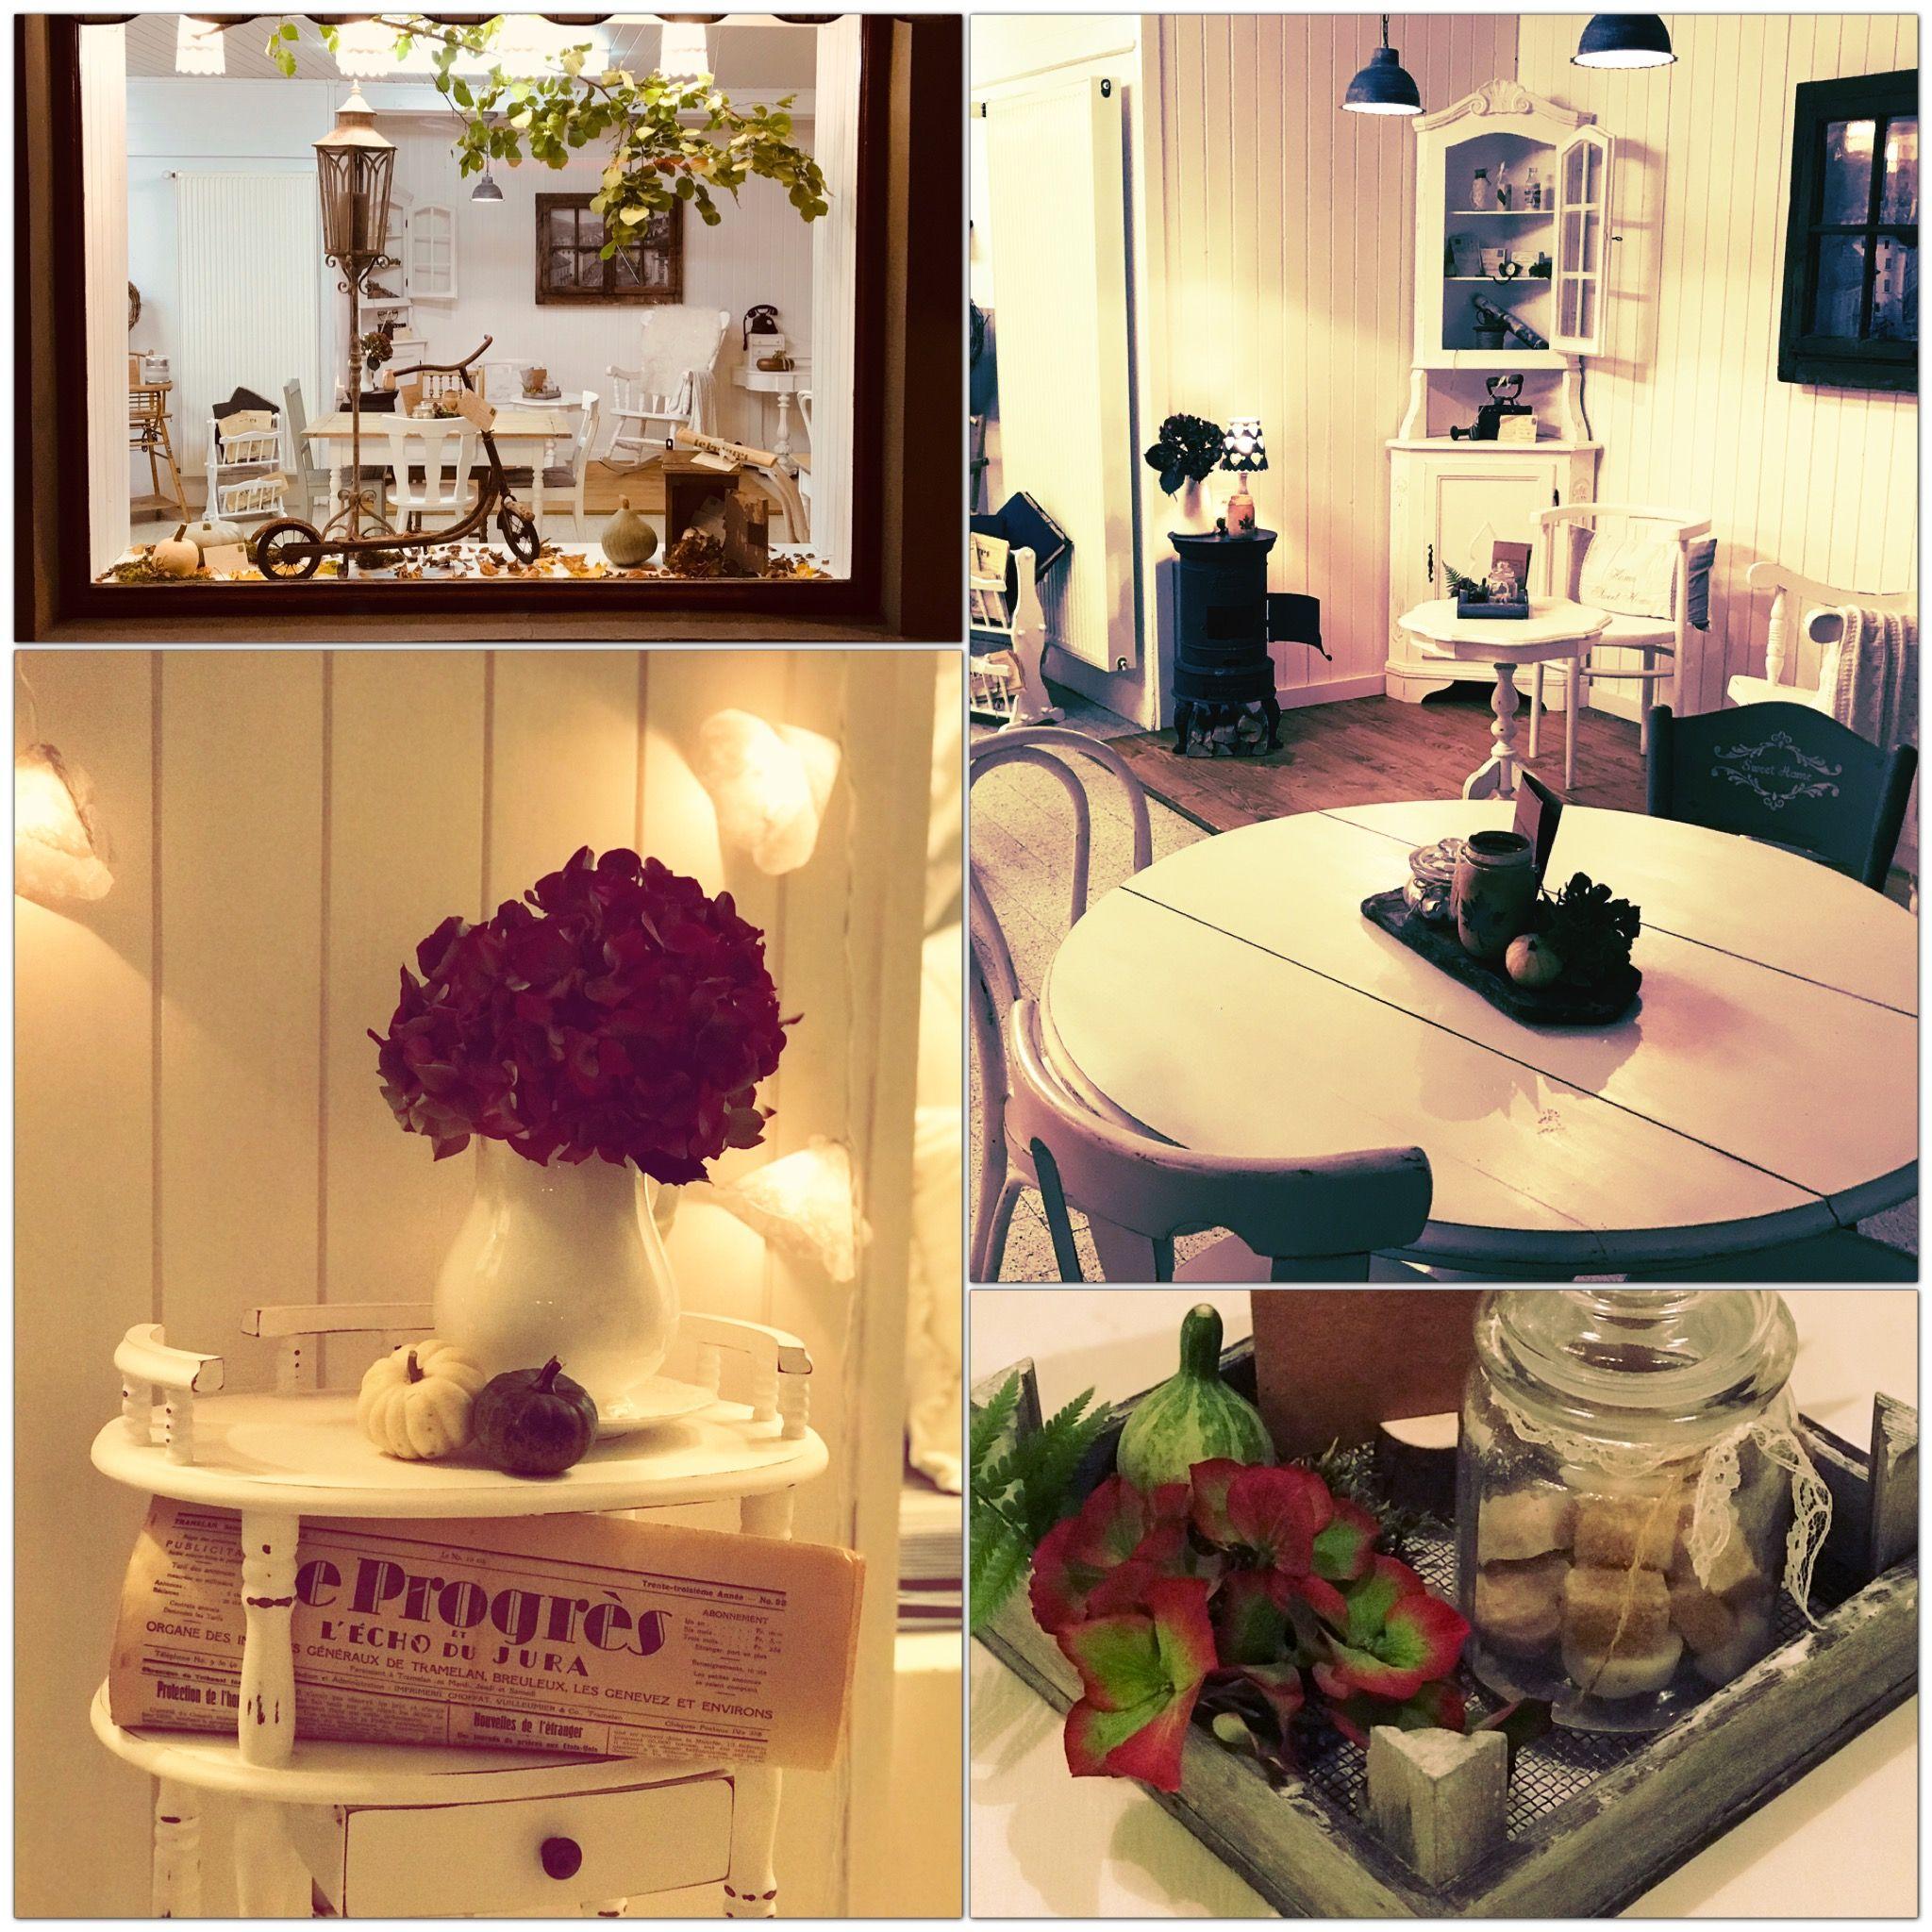 Pin Von Doudou73 Auf Cafe Partages Lovely Place